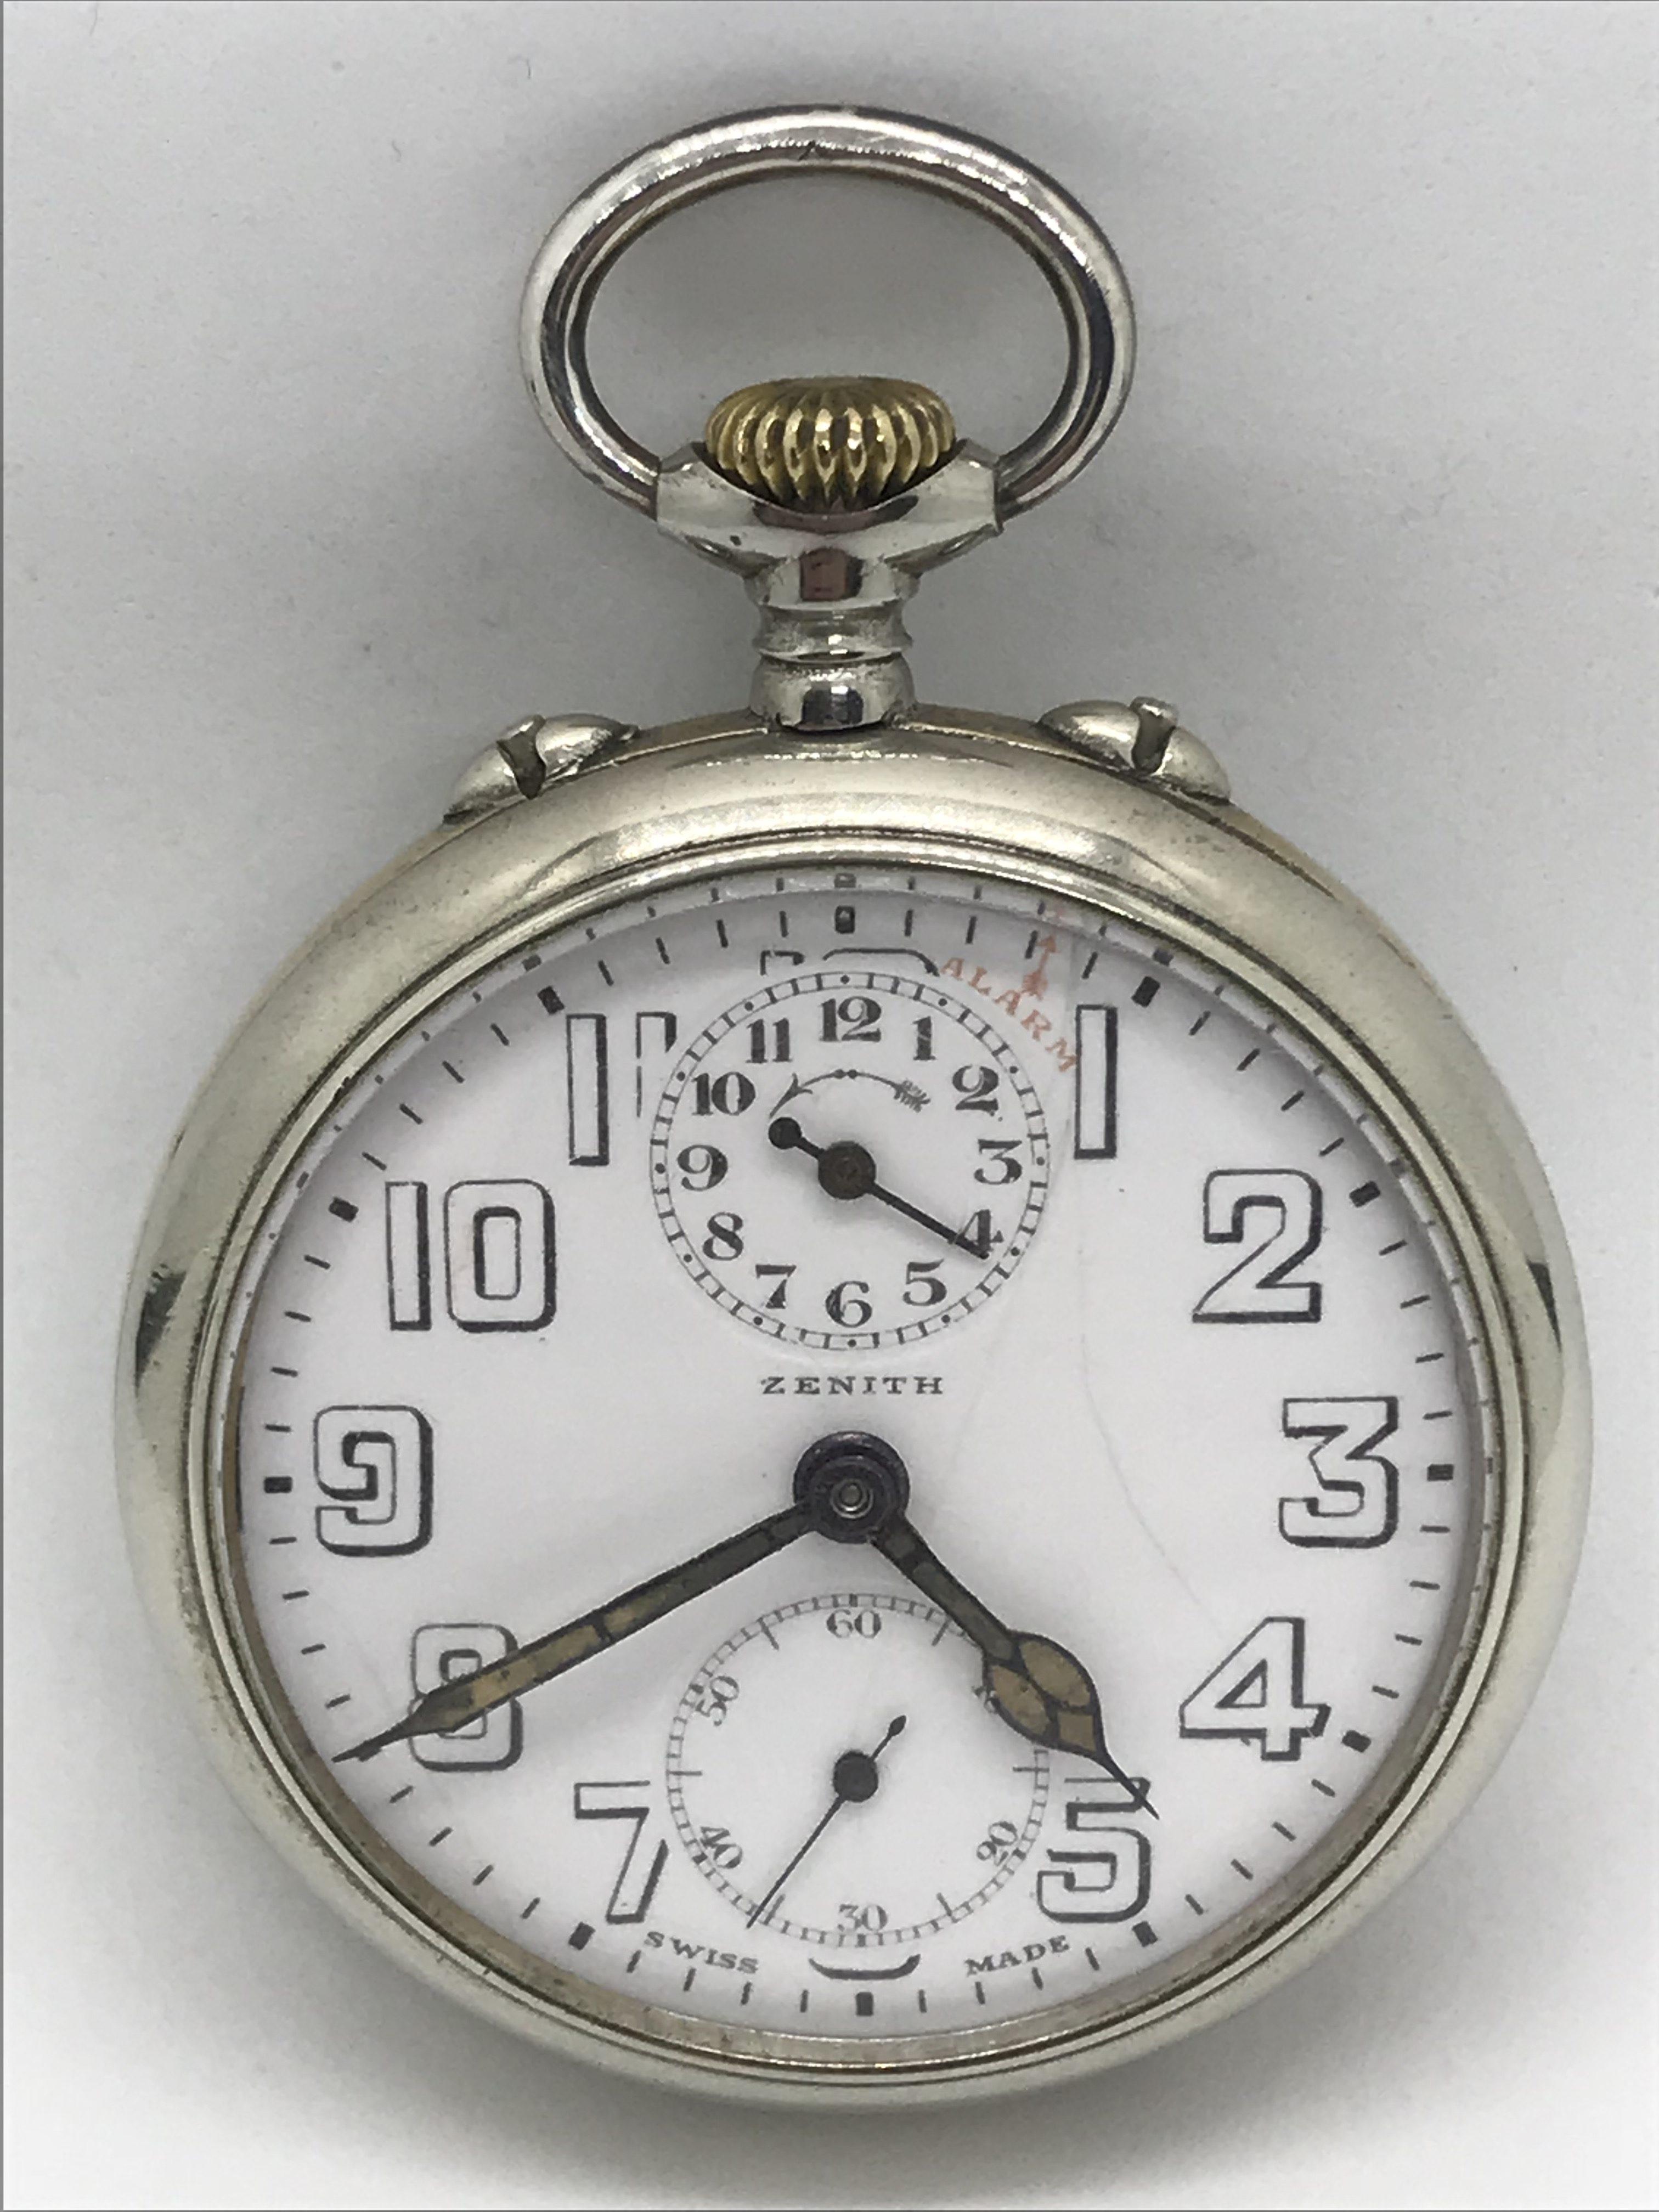 Domů Kapesní hodinky Starožitné 2 plášťové ( nickel chrom ) hodinky Zenith  s budíkem. Previous 9e121acbb0